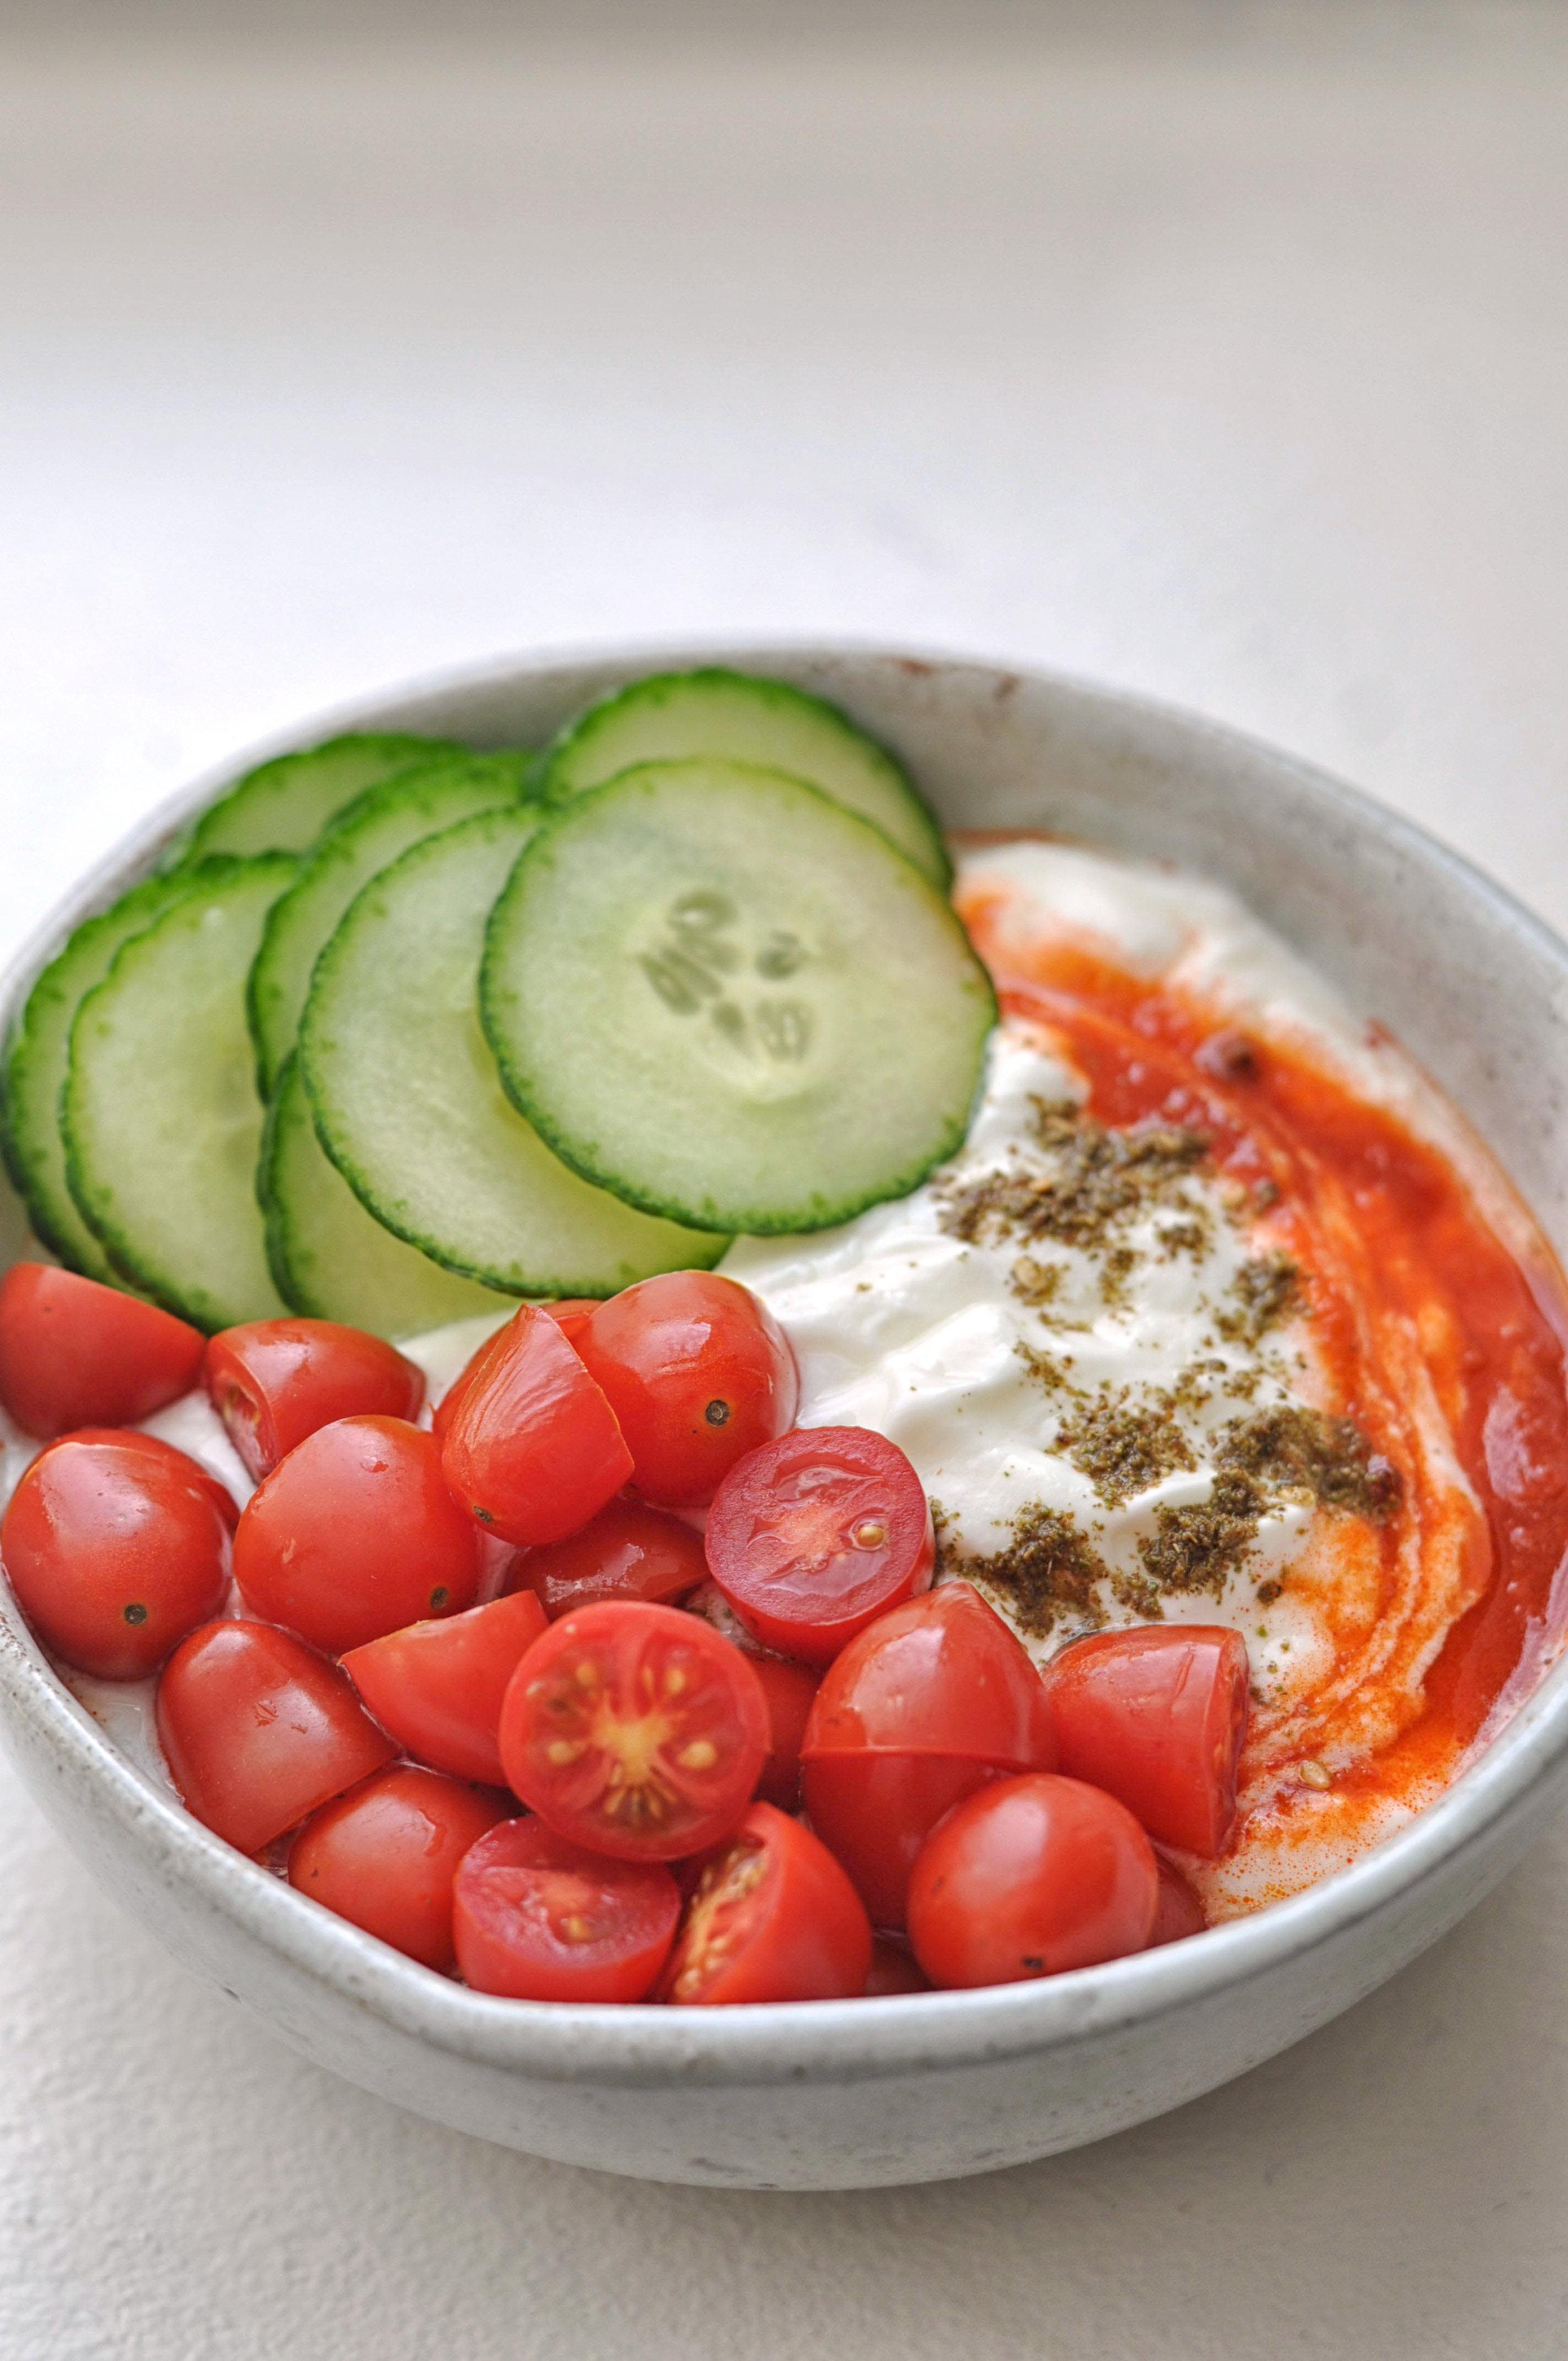 Savory Yogurt with harissa, za'atar, grape tomatoes, and cucumbers - a healthy way to start the day. | Shiny Happy Bright